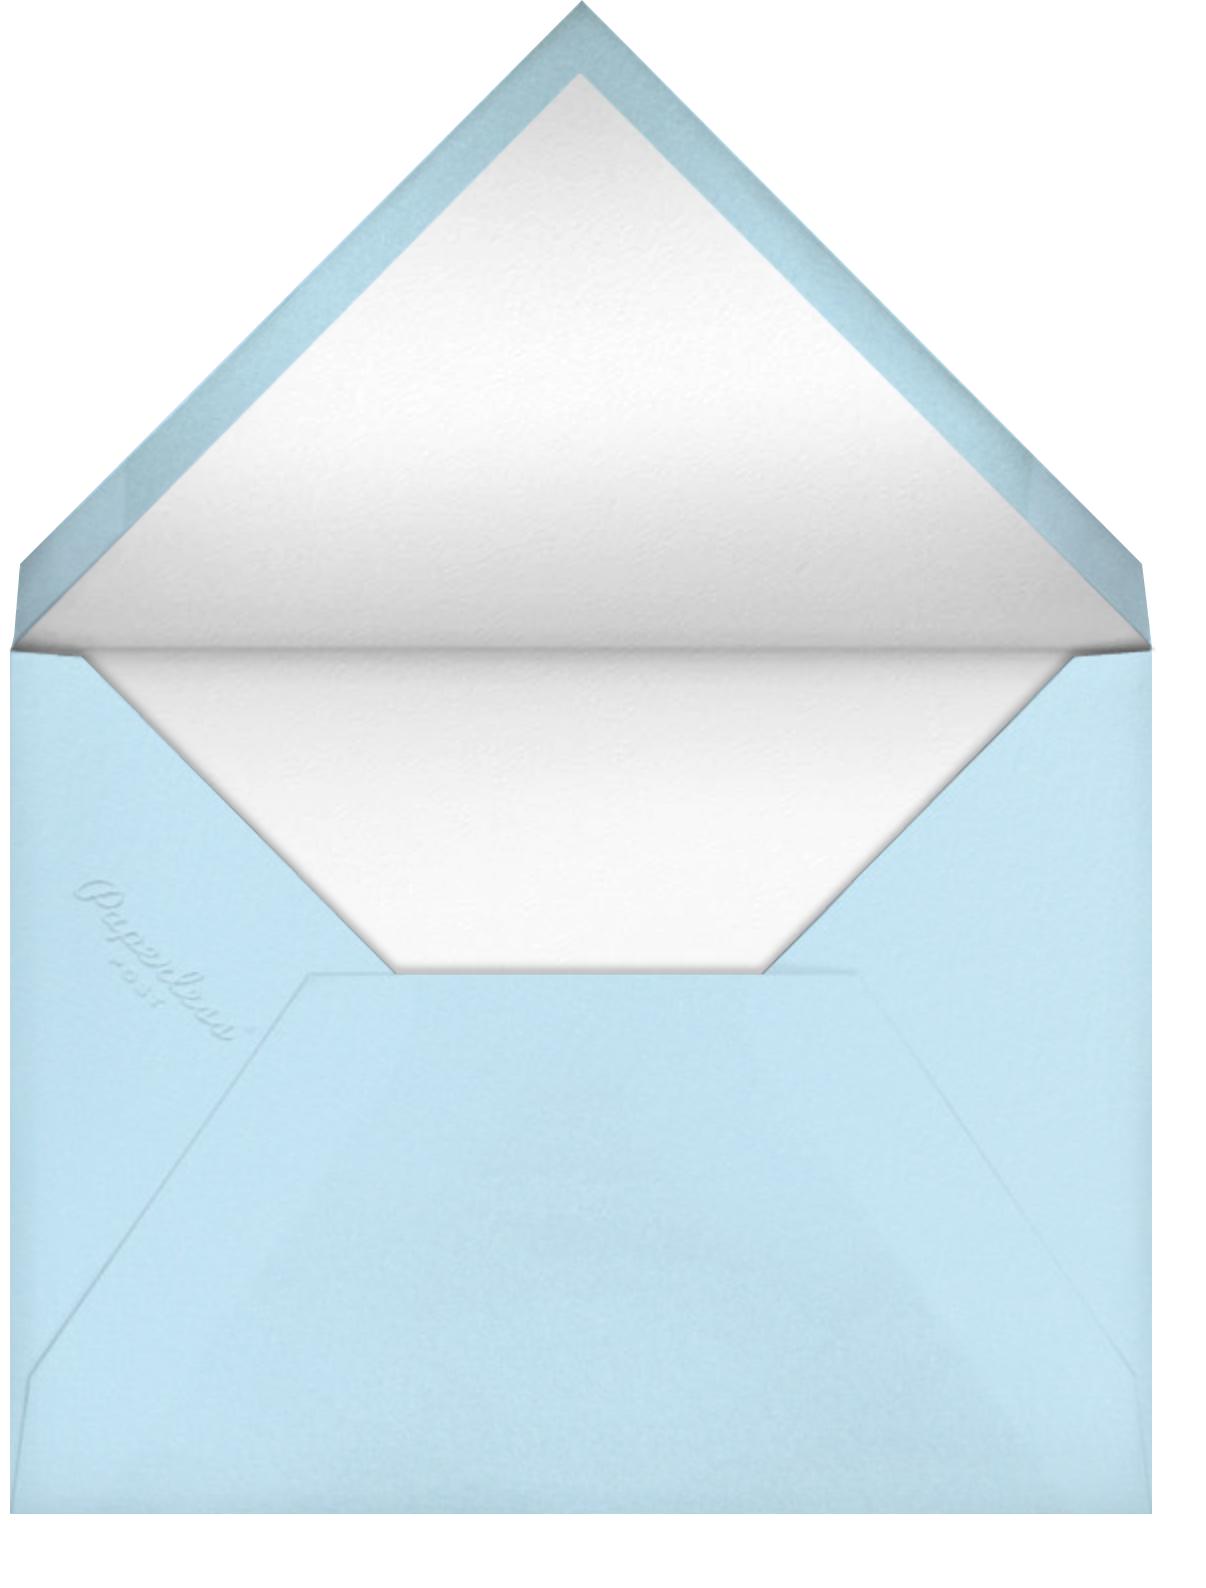 Maine Lighthouse (Becca Stadtlander) - Red Cap Cards - Thank you - envelope back